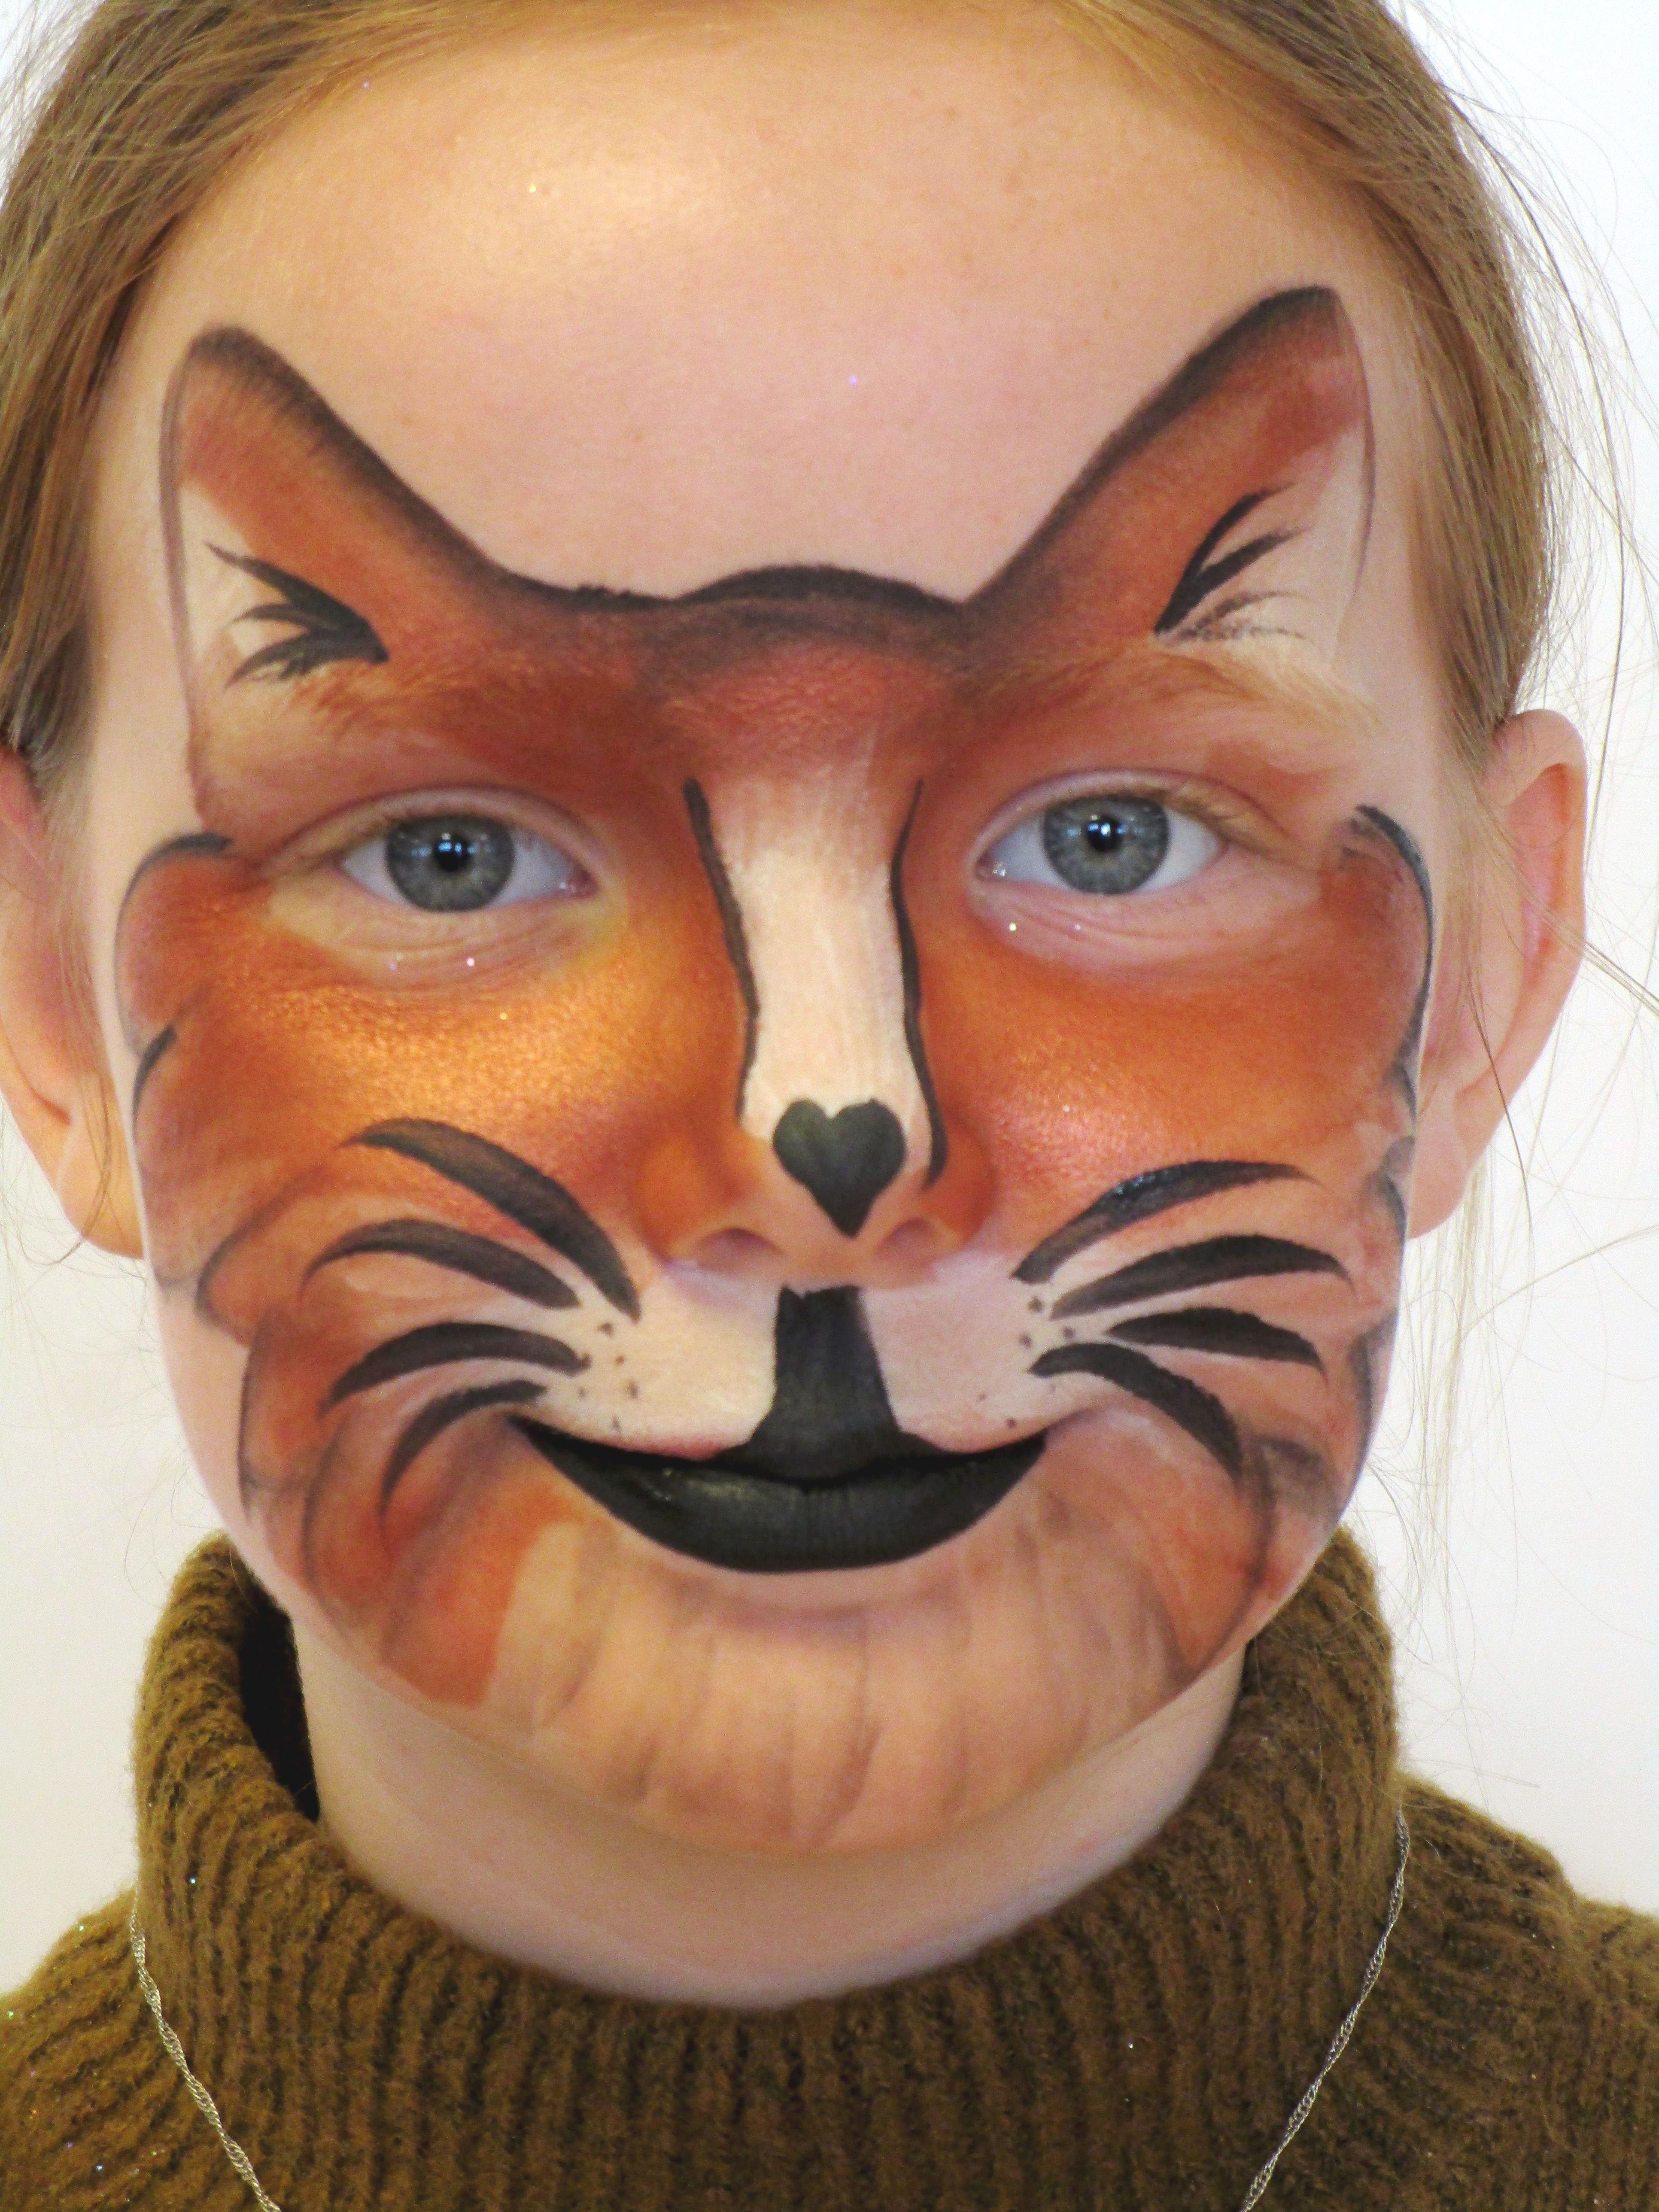 Fox / Cat Face Paint. Ræv / Kat Ansigtsmaling